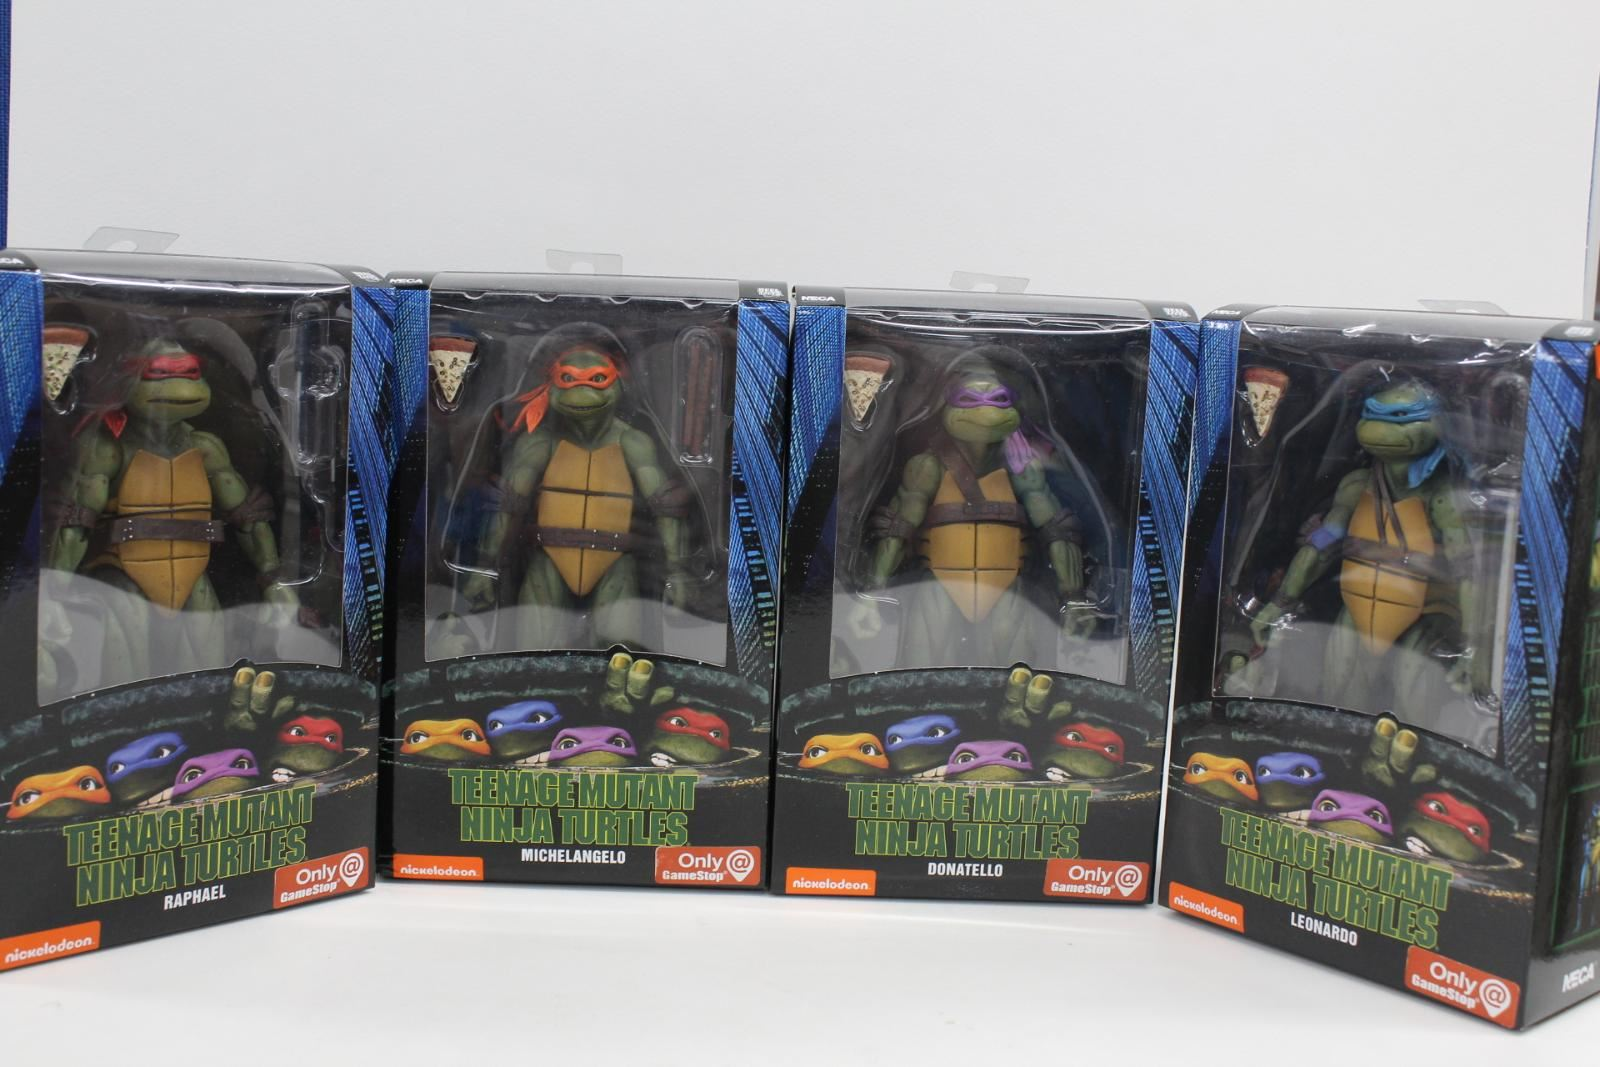 NECA Reel Toys Teenage Mutant Ninja Turtles Tmnt Figura De Acción Set 4 4 7  Nuevo